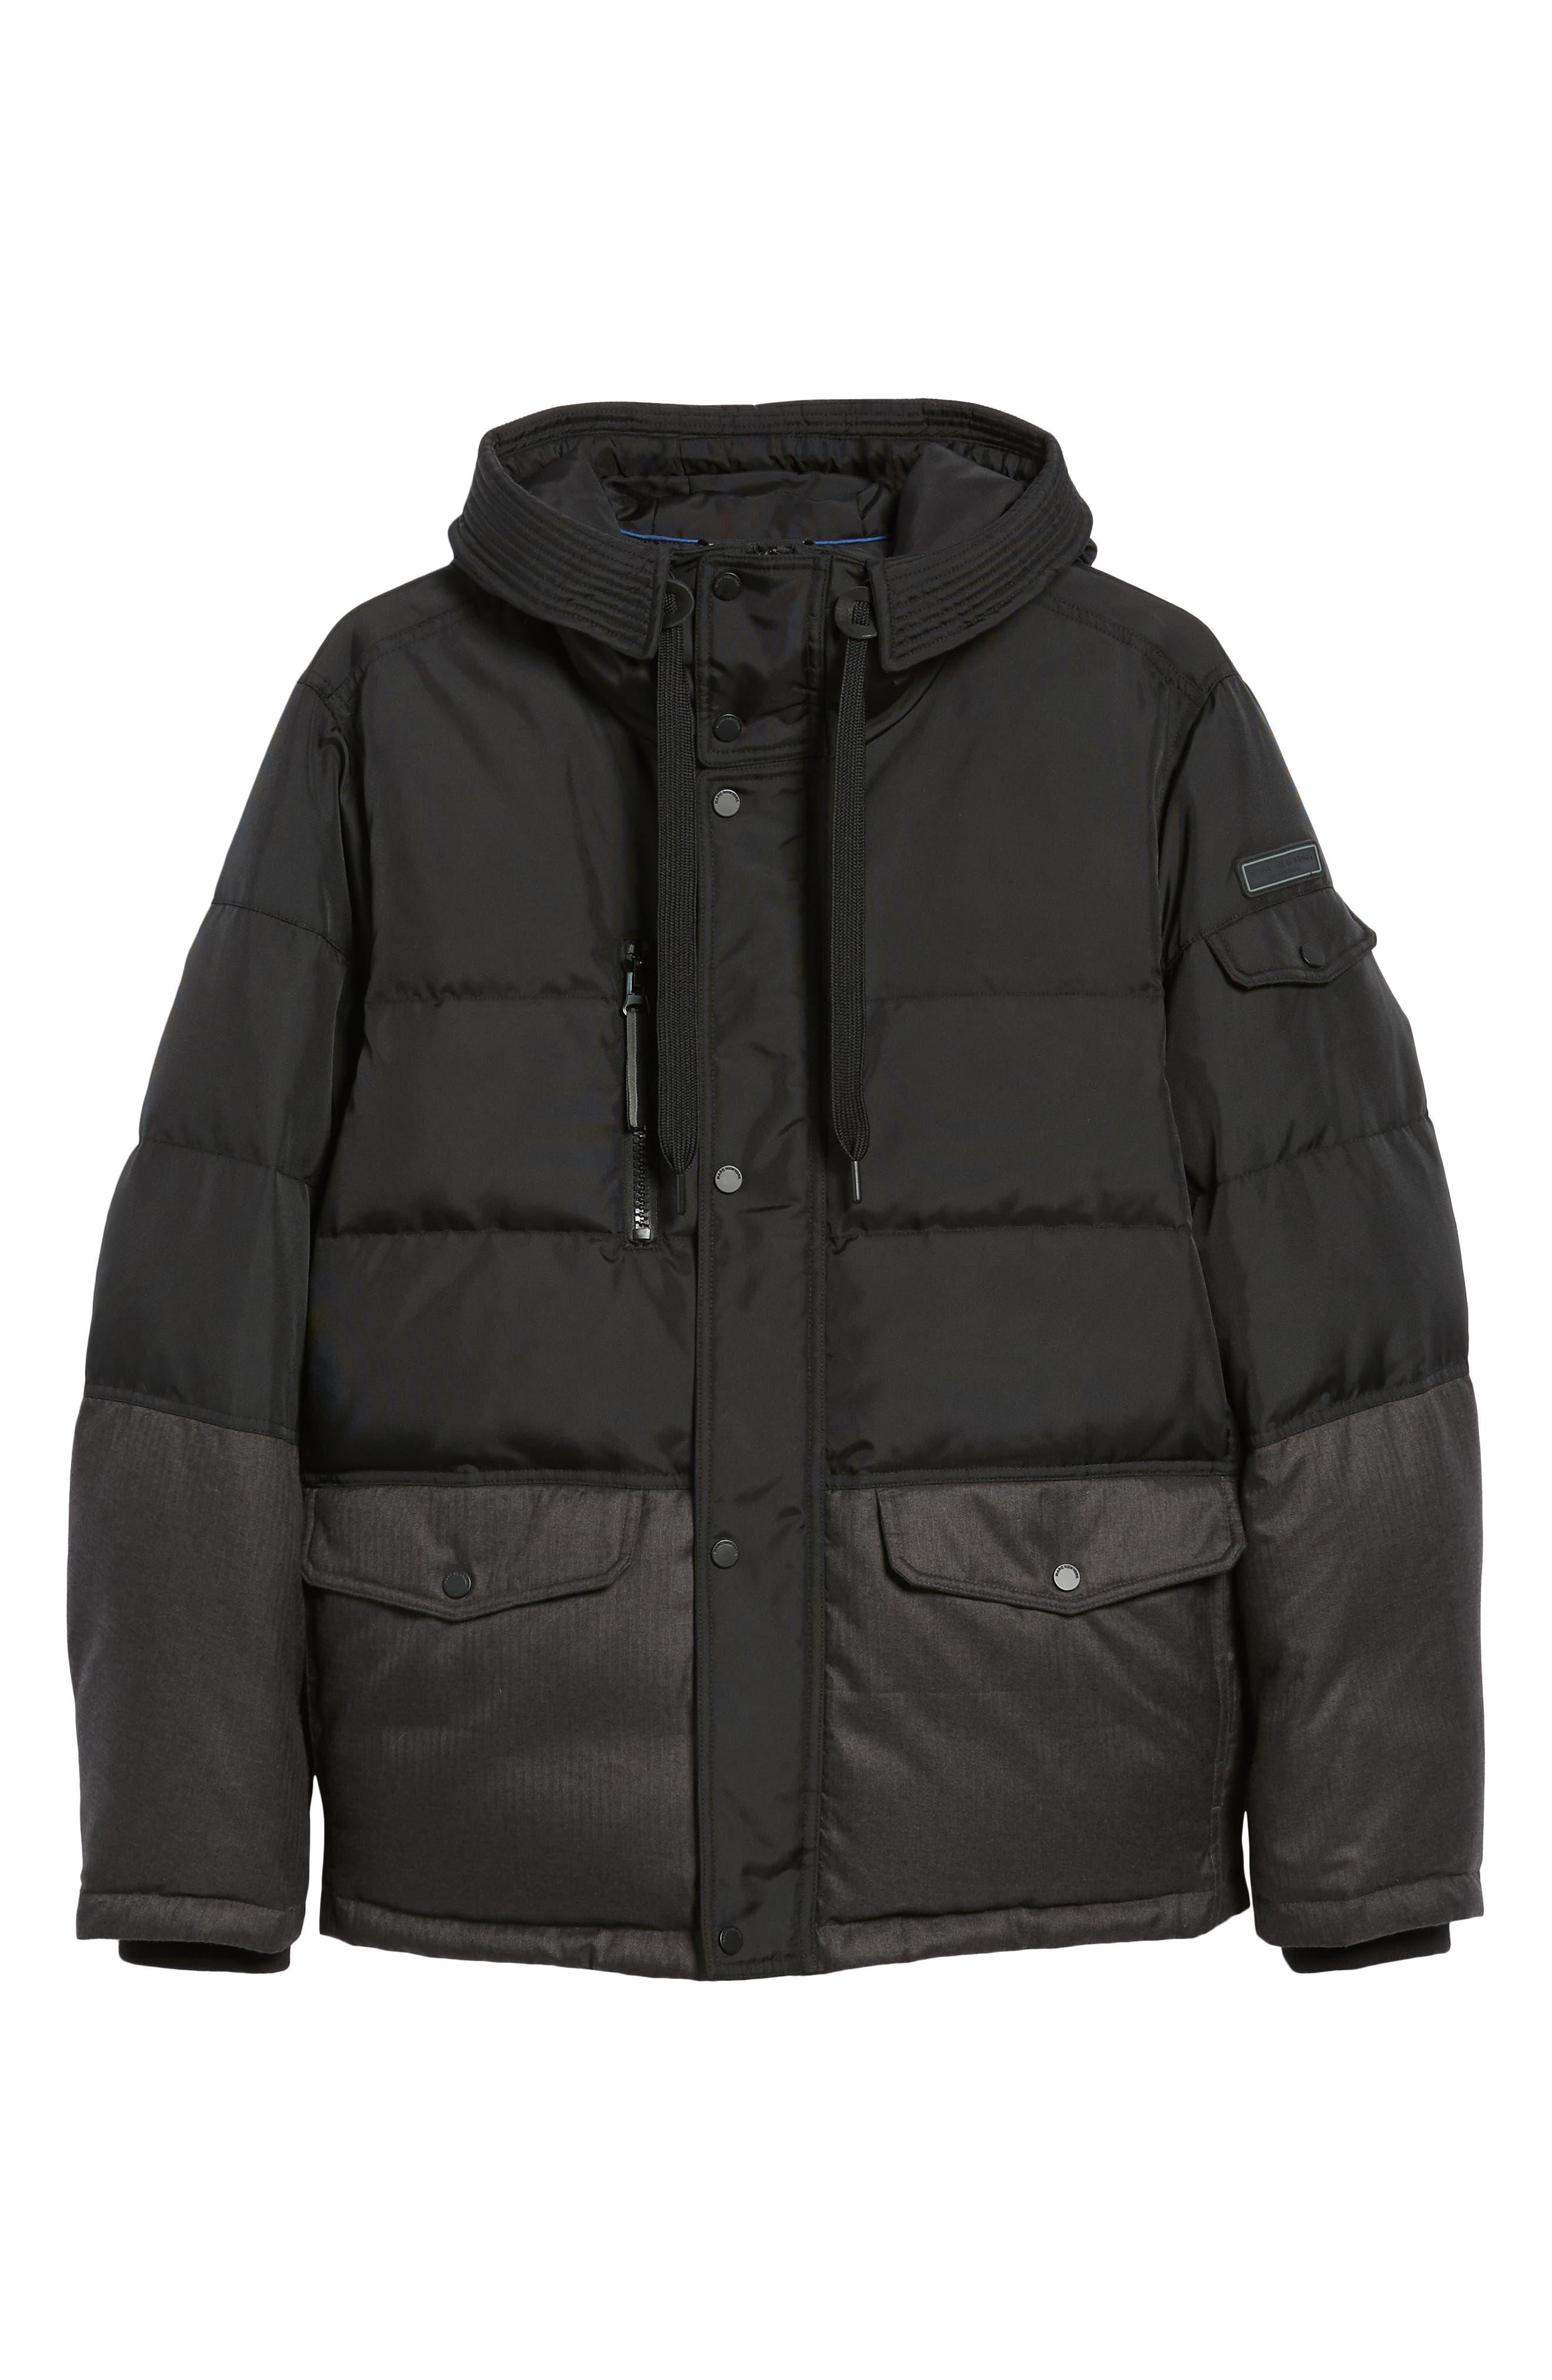 MARC NEW YORK,                             Stanton Oxford Puffer Jacket,                             Alternate thumbnail 6, color,                             BLACK